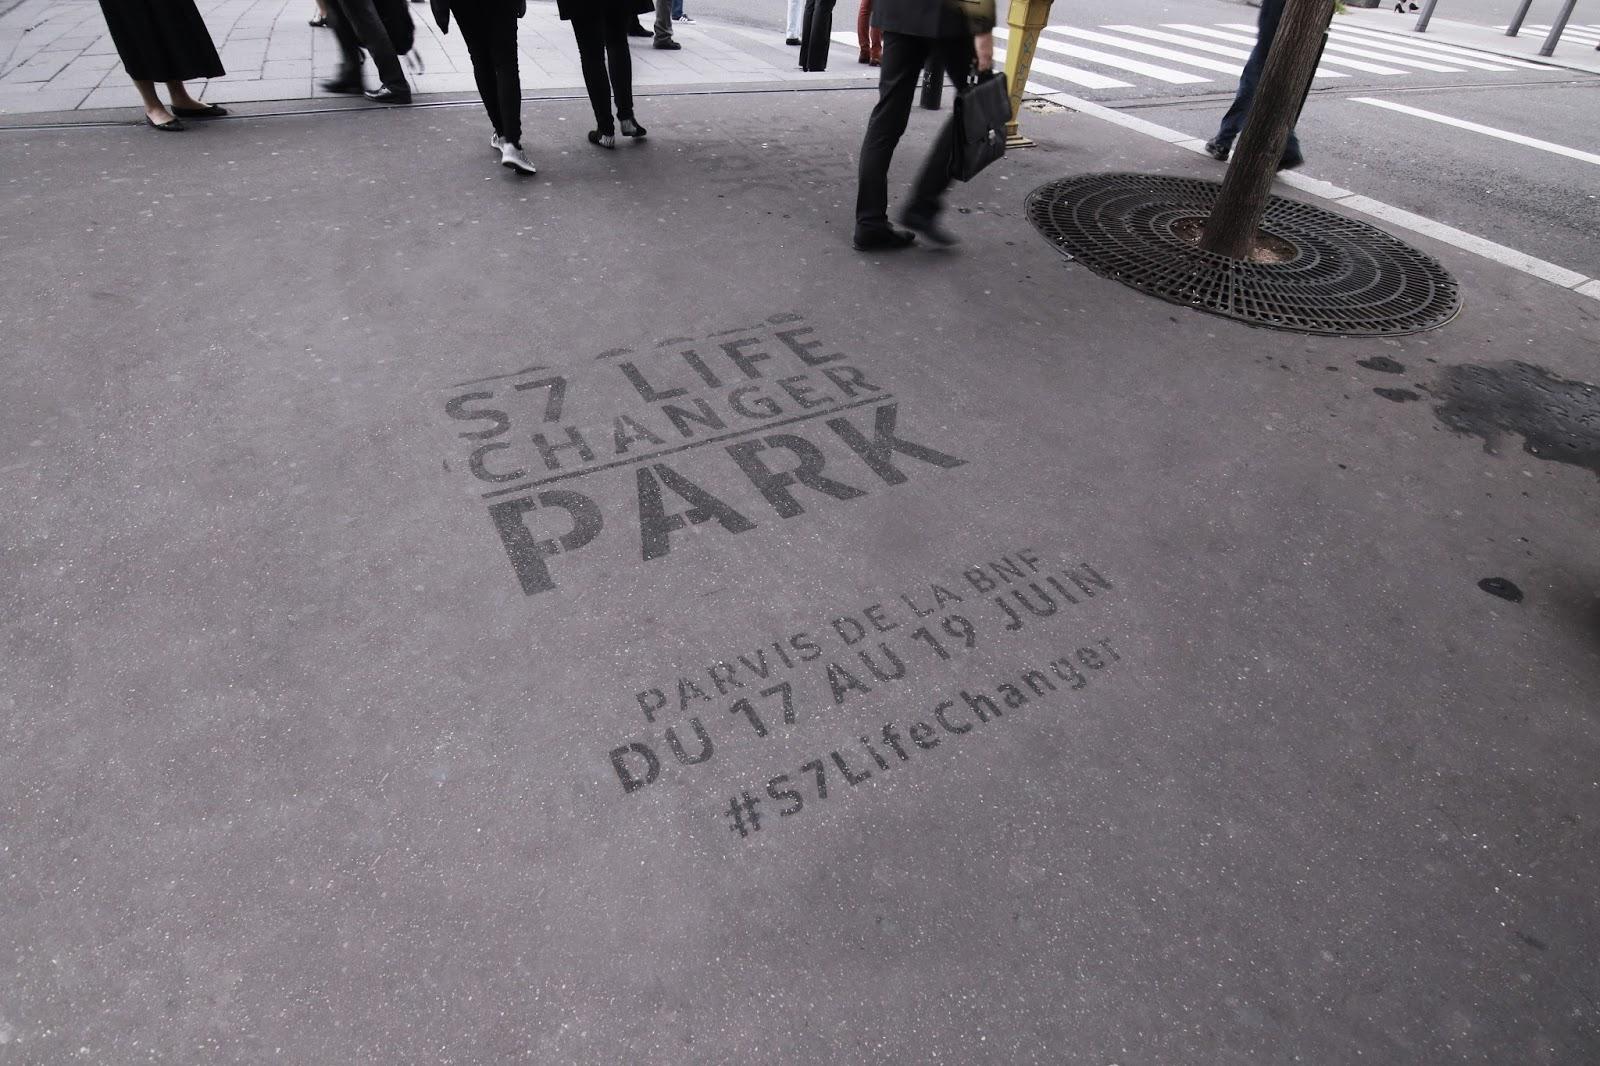 S7 Life changer Park Samsung